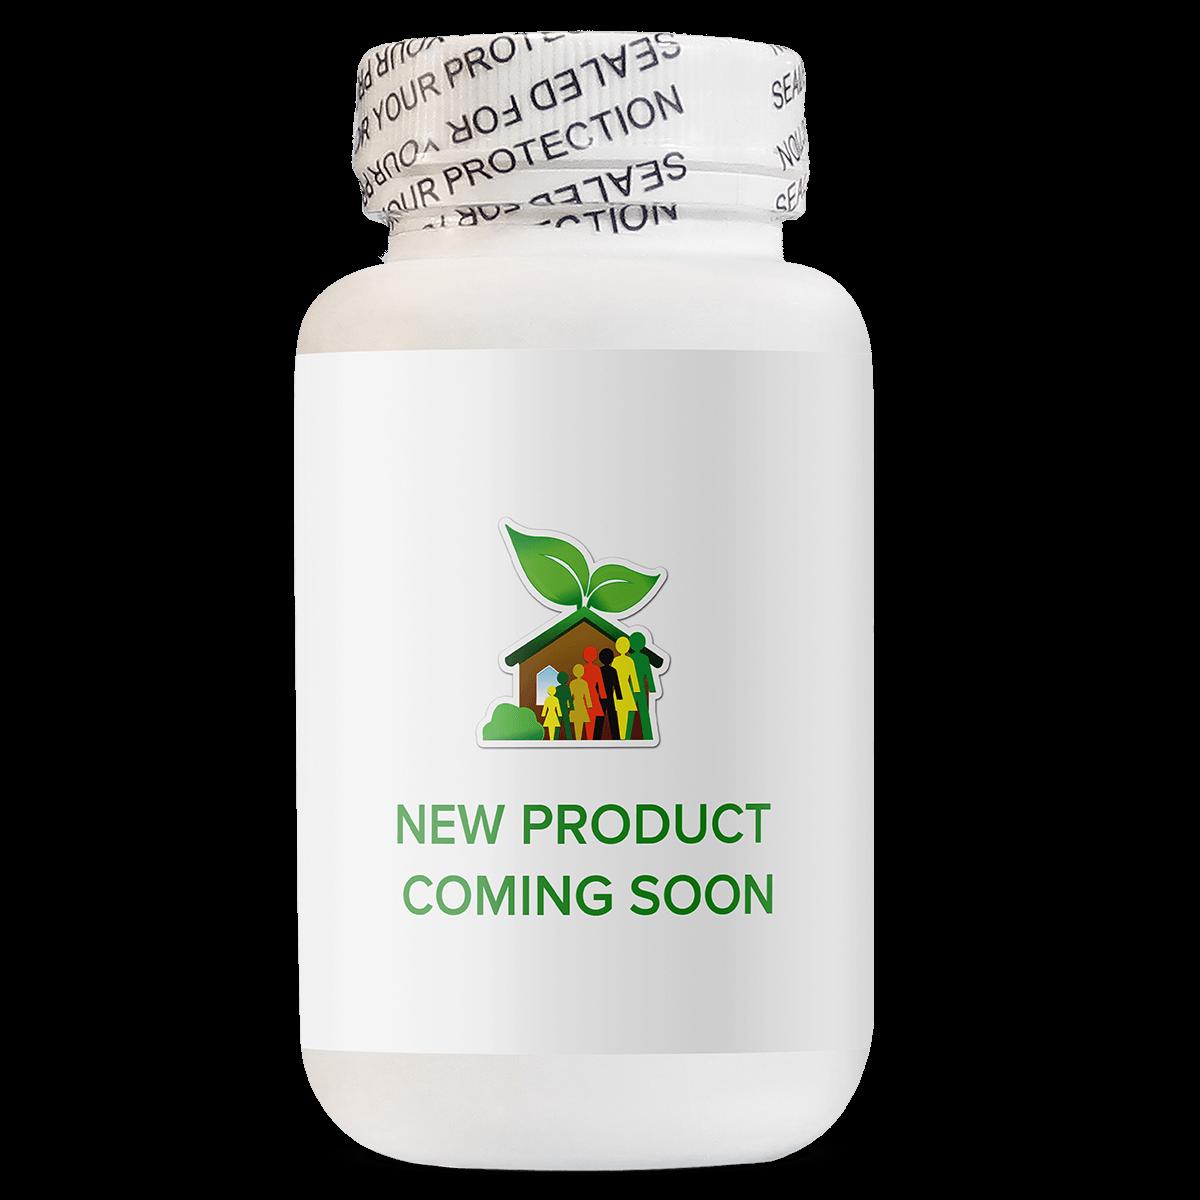 Coming Soon White Bottle